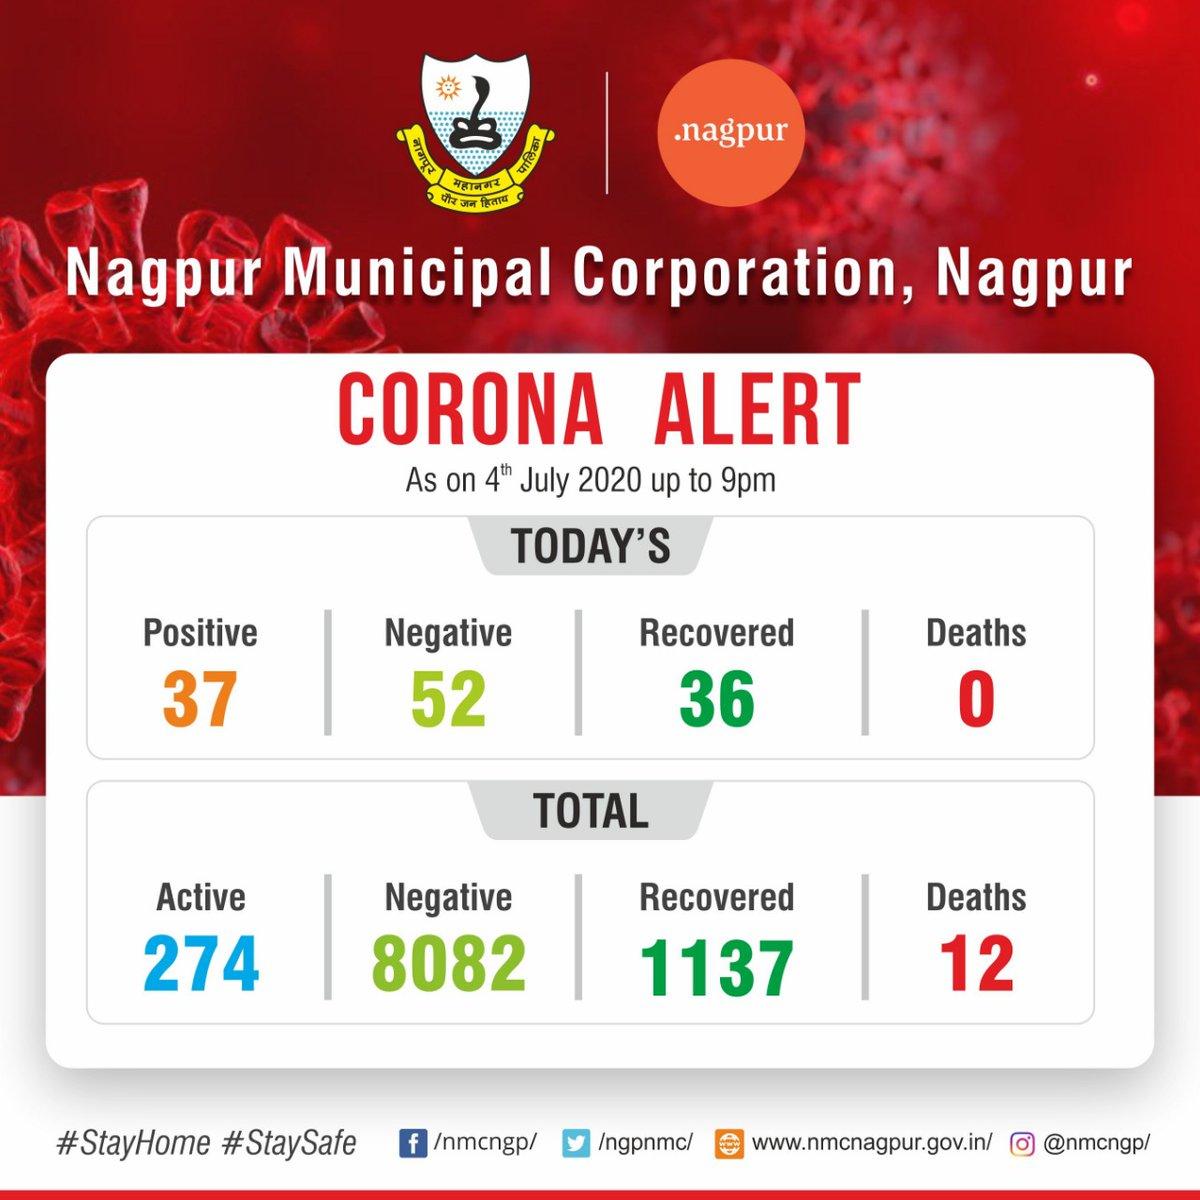 NMC #Covid_19 alert: total status update of the COVID19 cases as on 4 July 2020 #CoronaUpdatesInIndia #WarAgainstVirus #IndiaFightsCoronavirus https://t.co/373WcXbPJ5